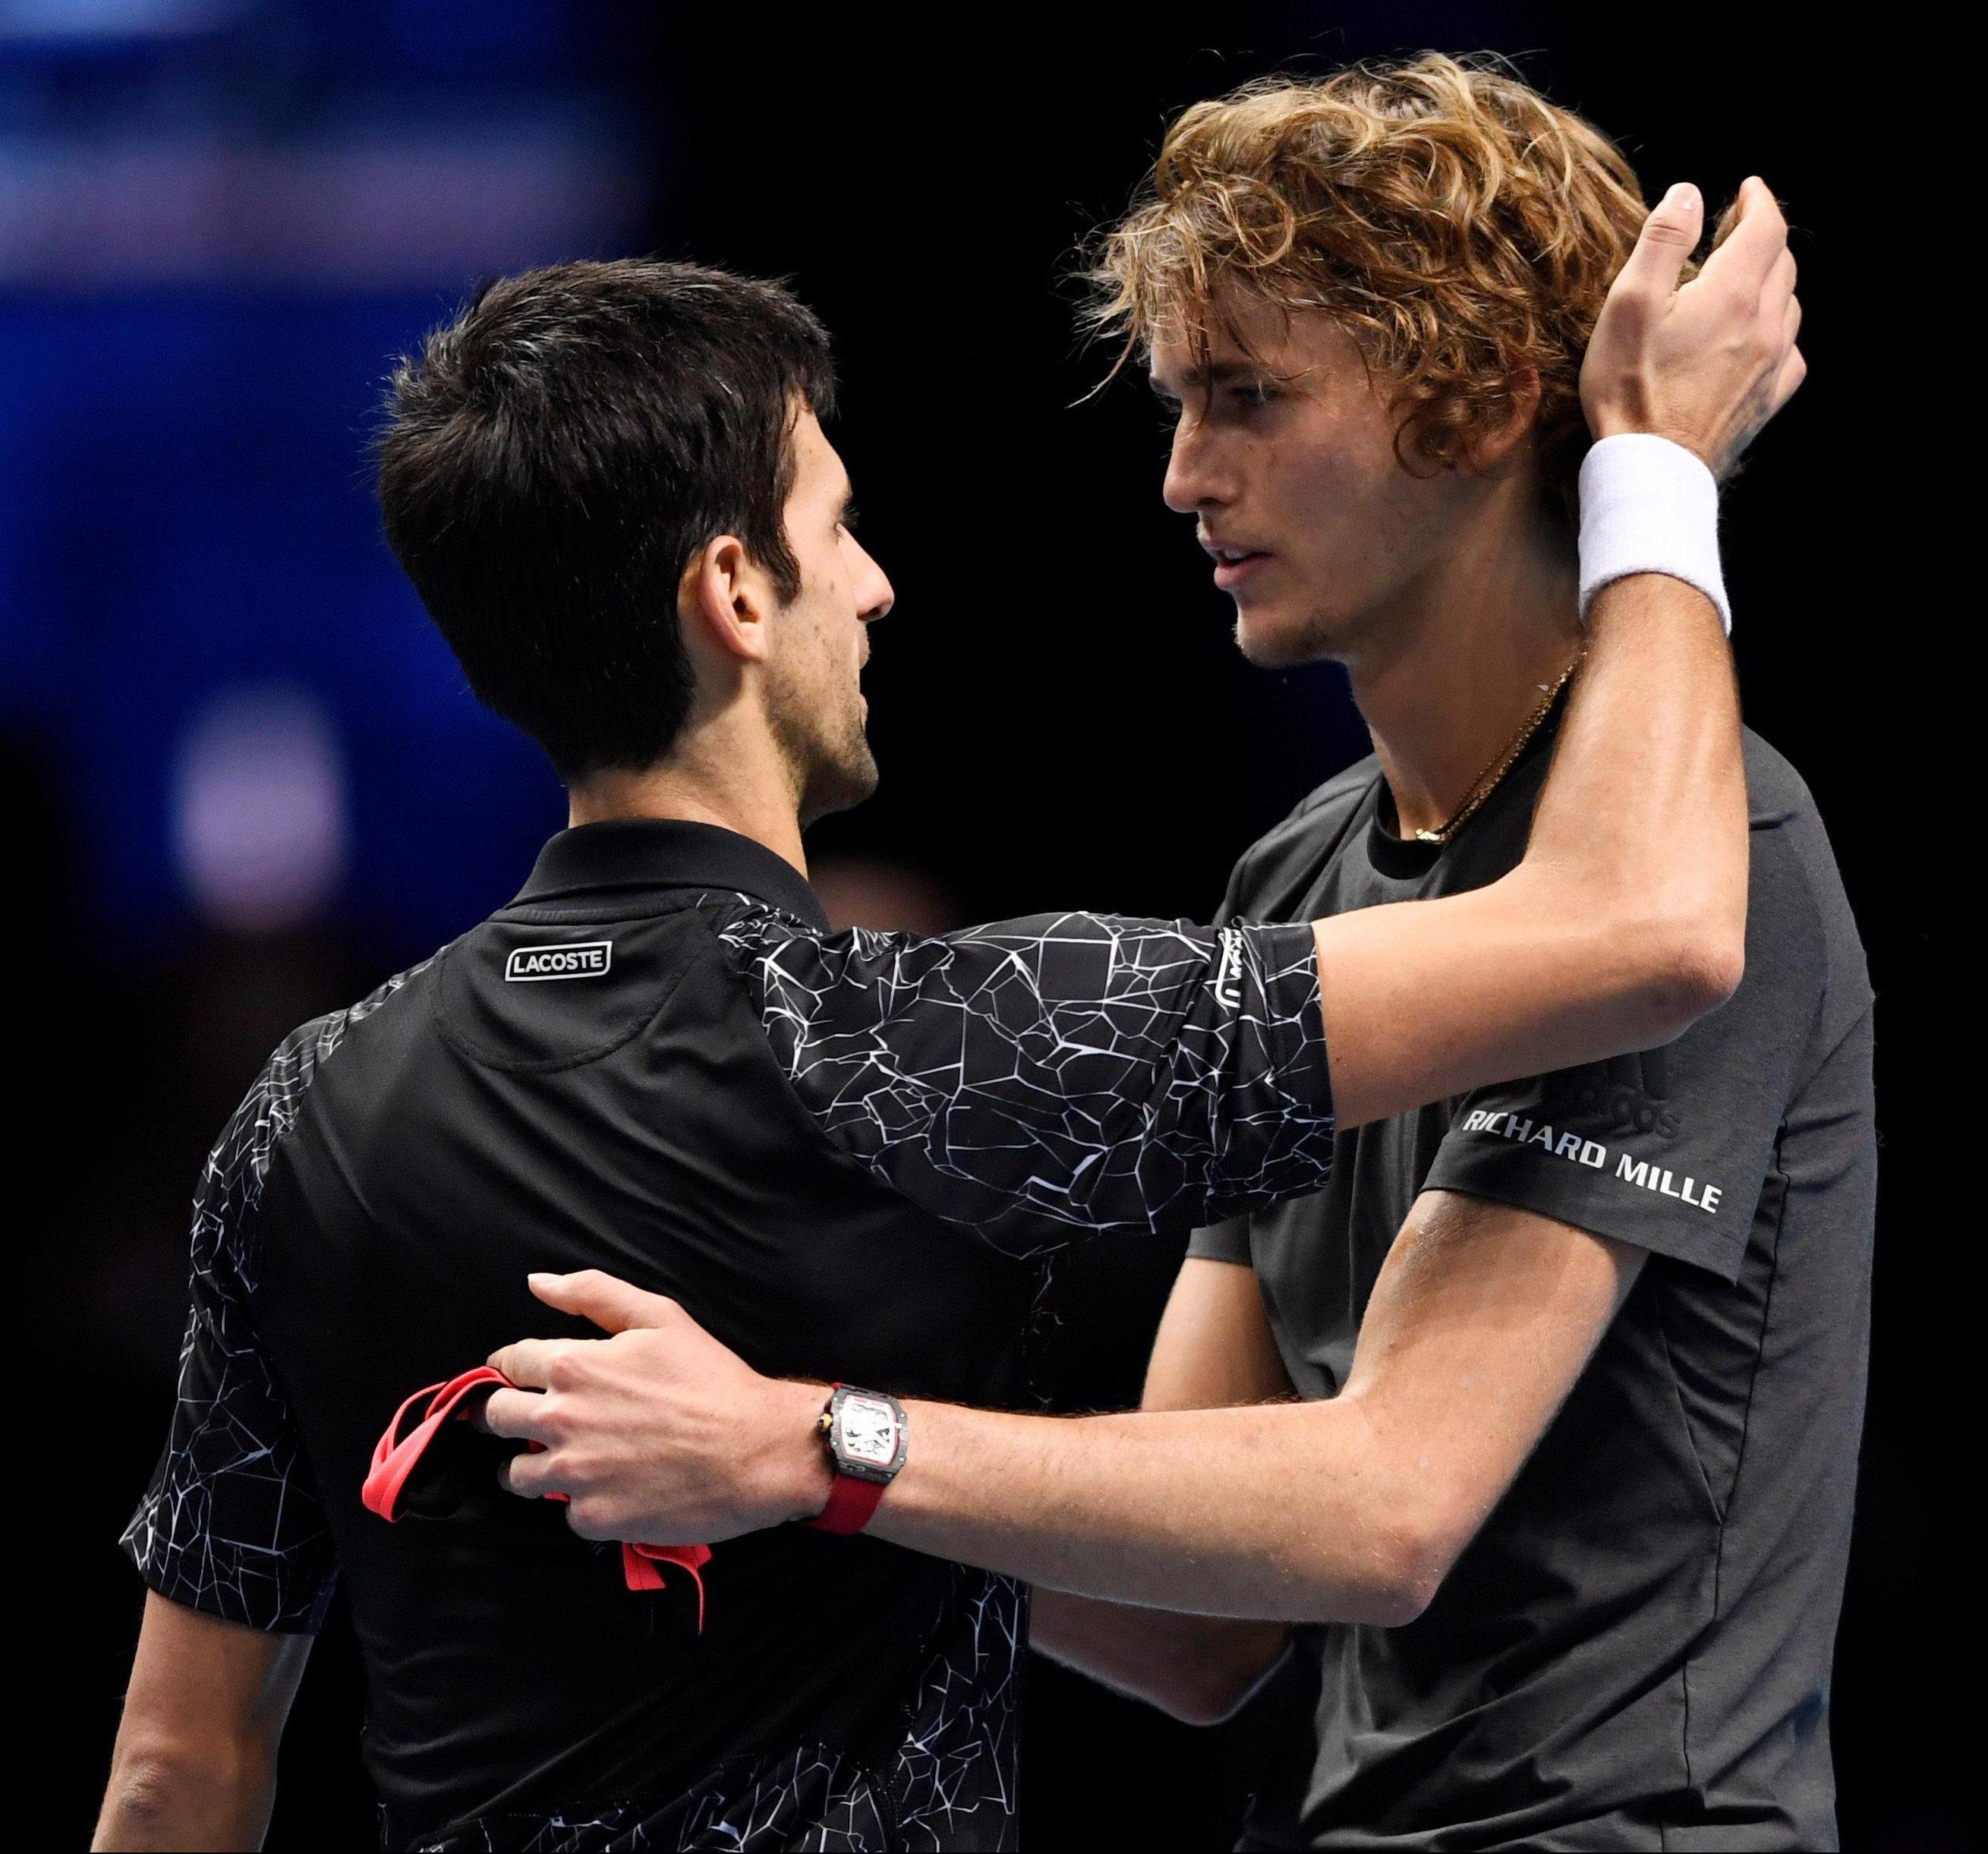 Novak Djokovic congratulates Alexander Zverev after the German followed up the scalp of Roger Federer with another huge win